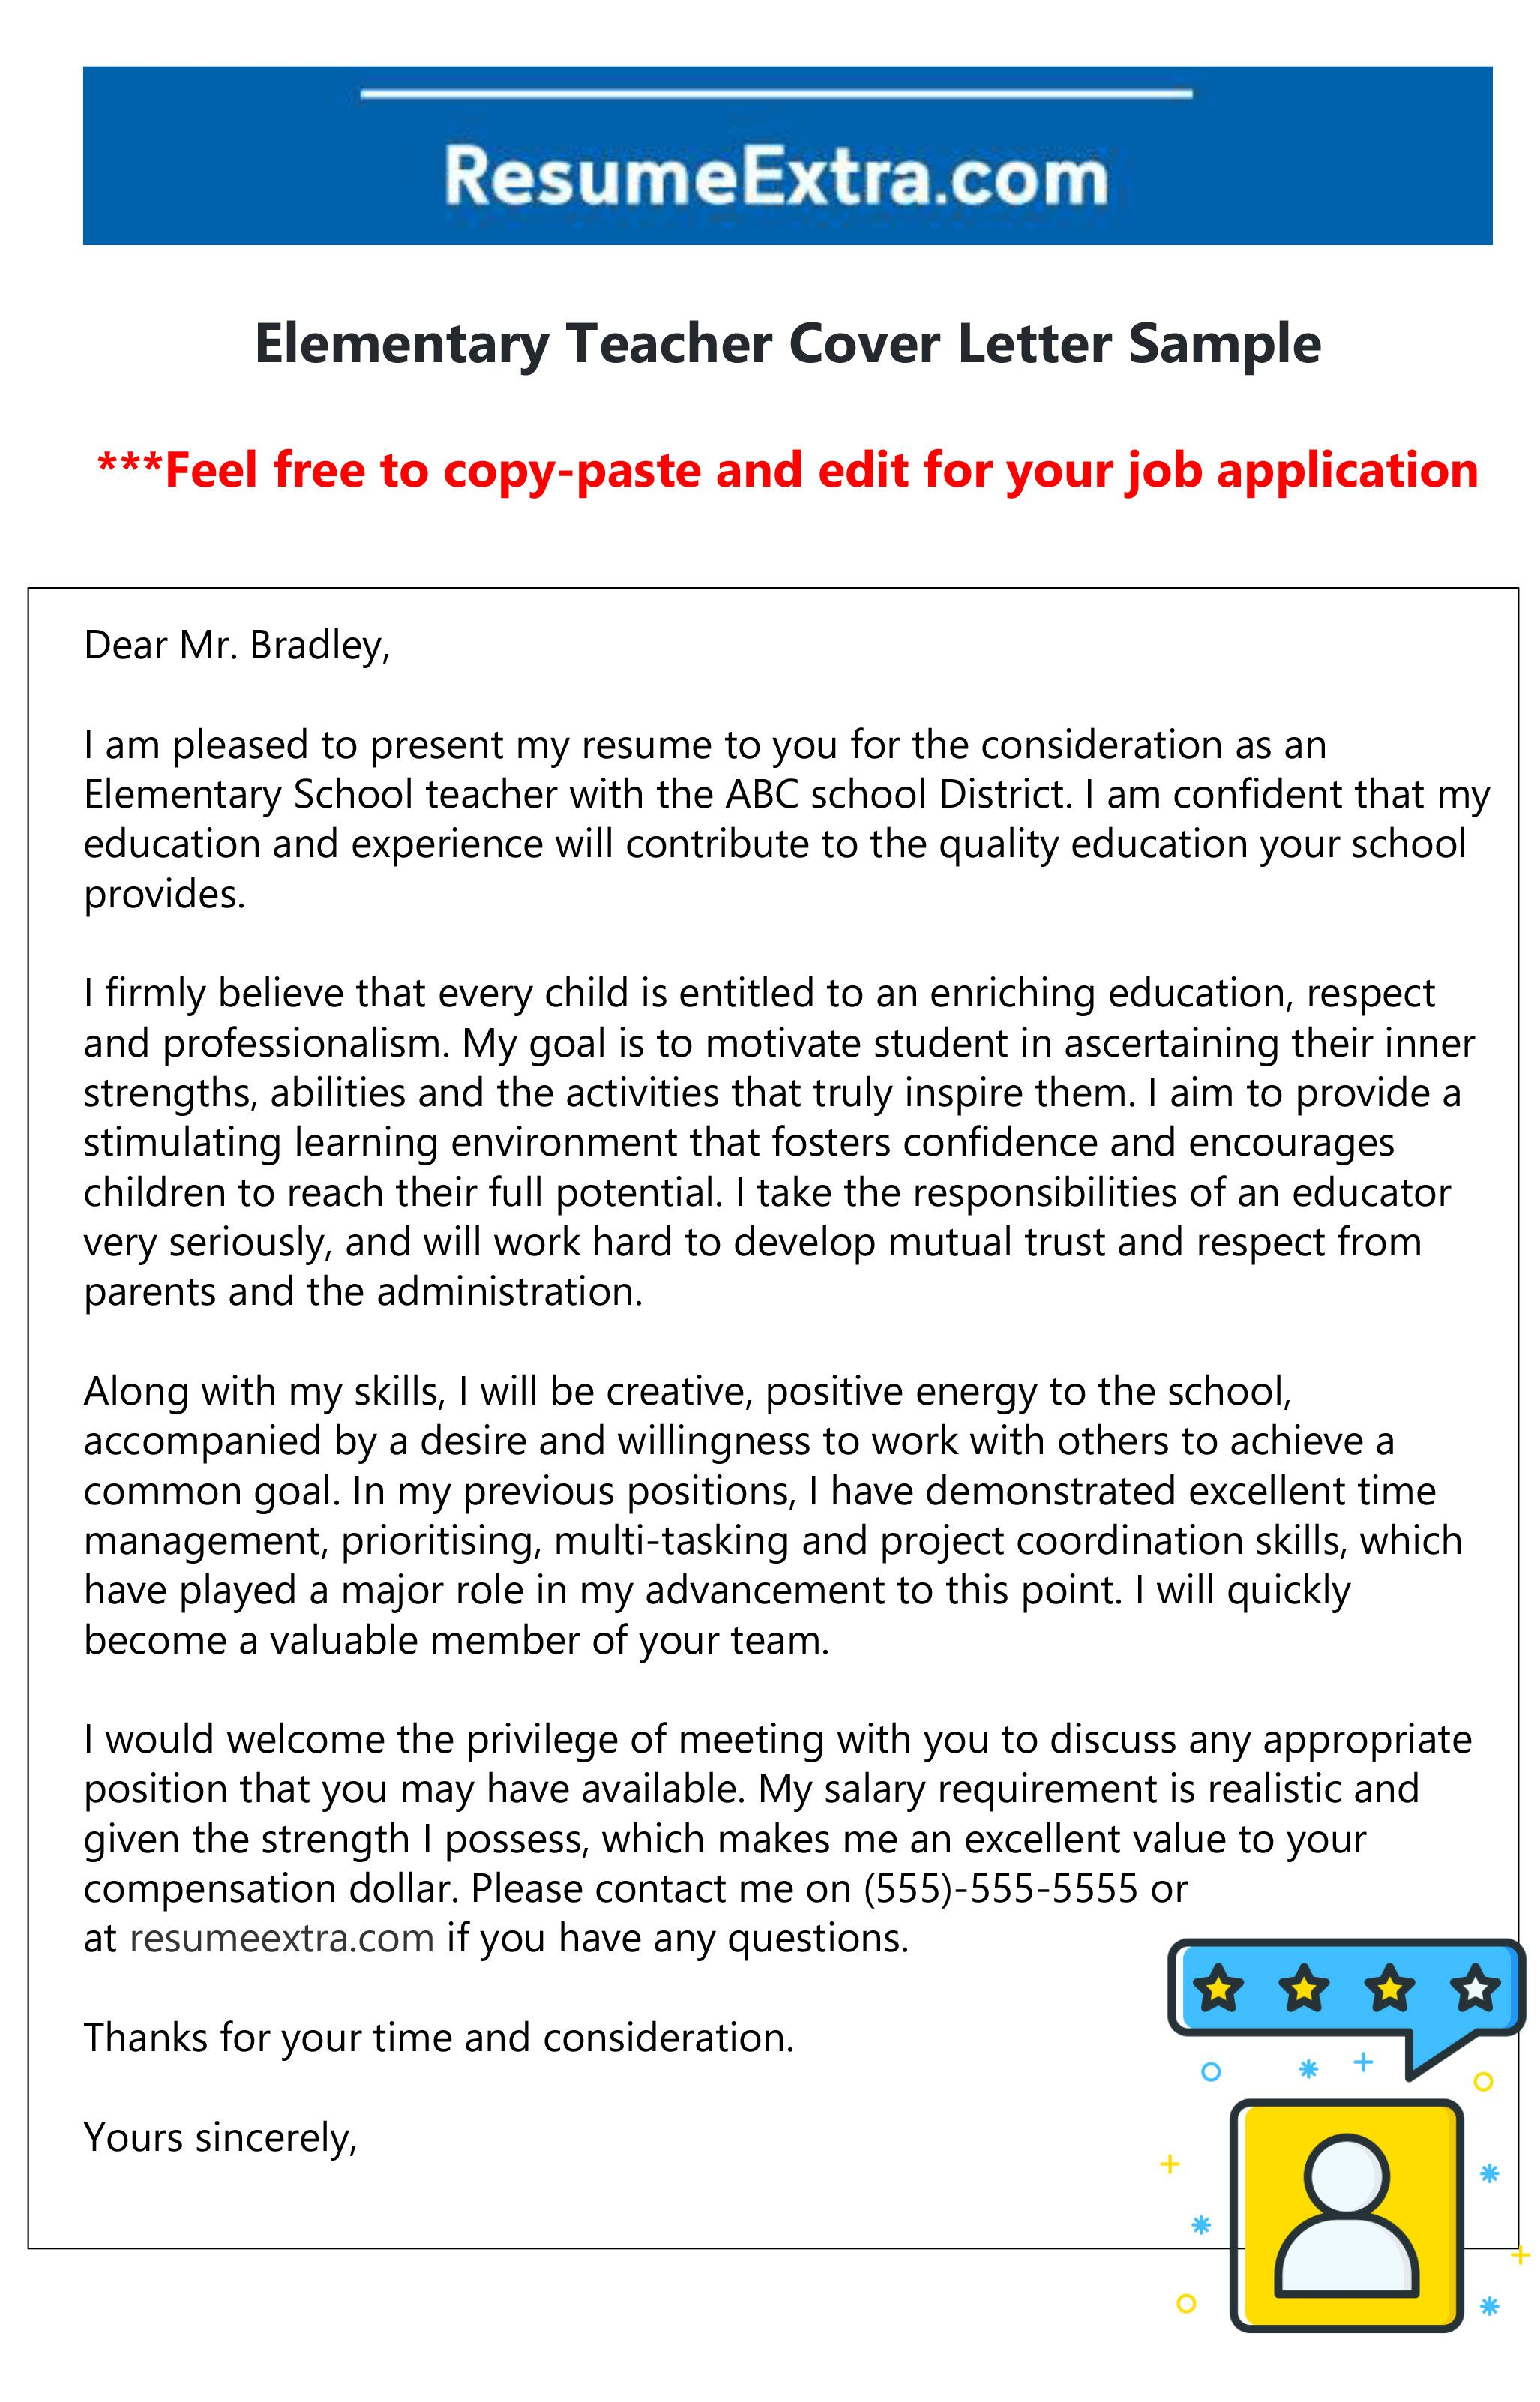 Free elementary teacher cover letter in 2021 application